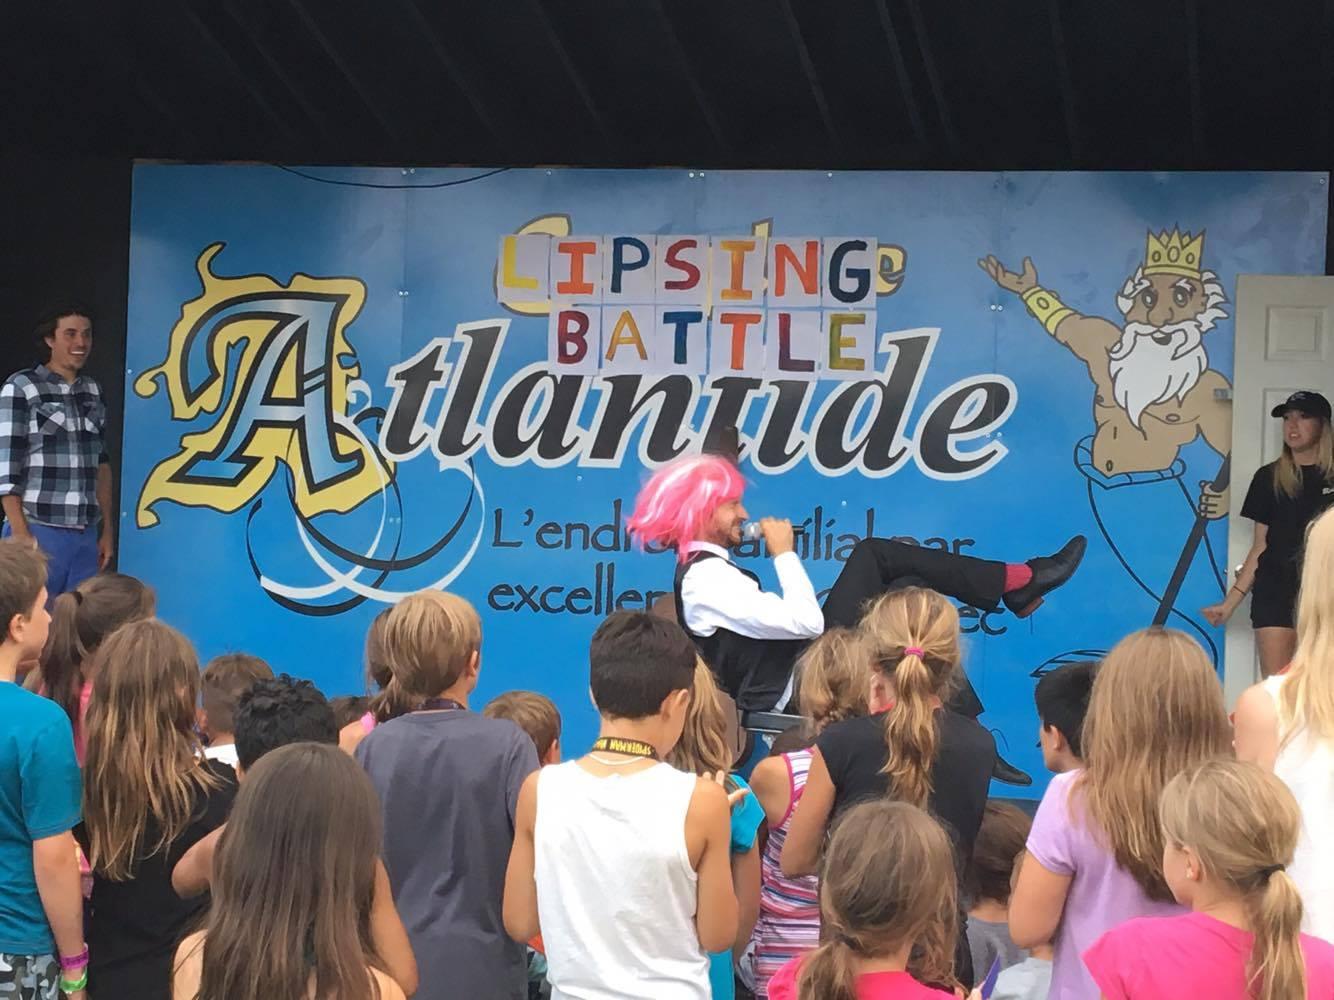 http://www.familycampgrounds.ca/wp-content/uploads/2017/08/lipsink-battle-complexe-atlantide-5.jpg